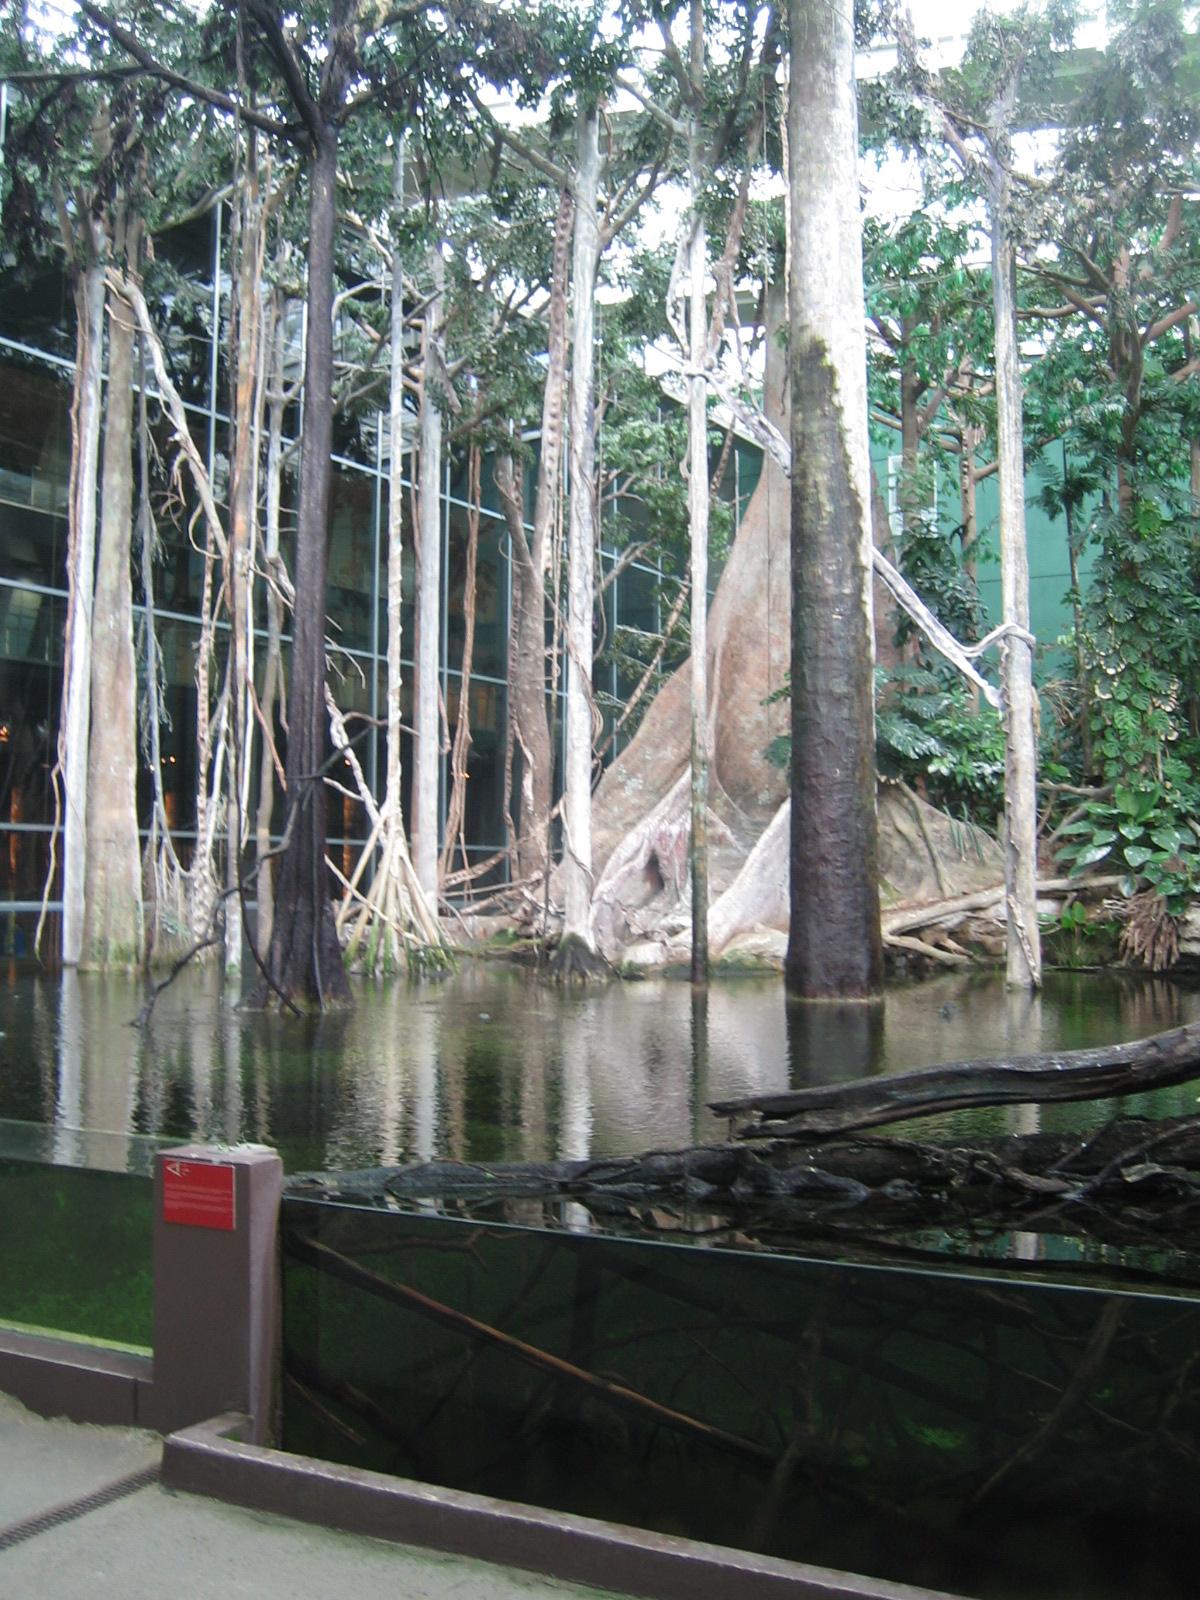 File:Rainforest Cosmocaixa.jpg - Wikimedia Commons